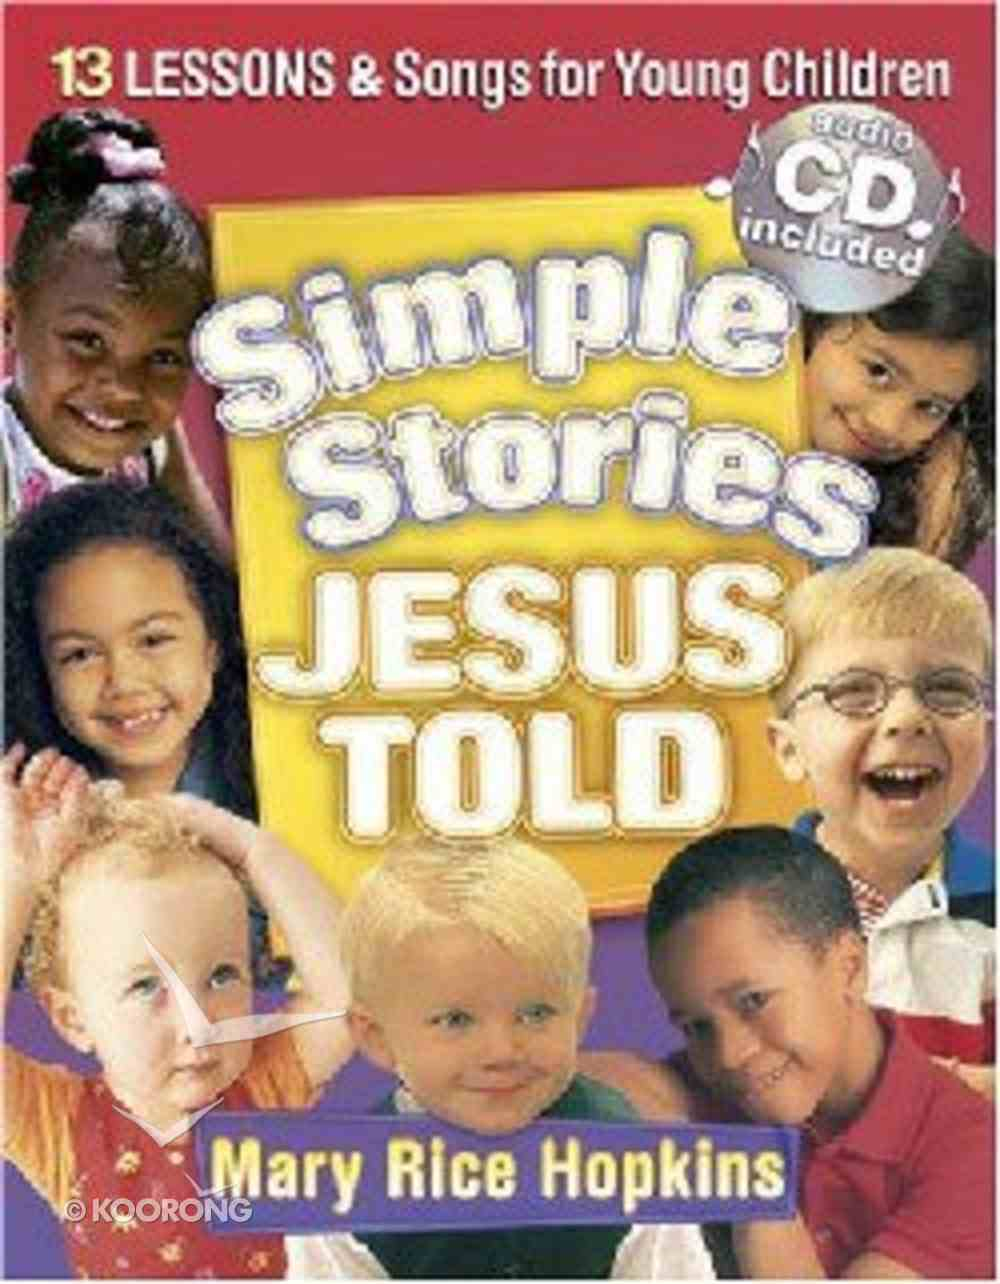 Simple Stories Jesus Told Paperback